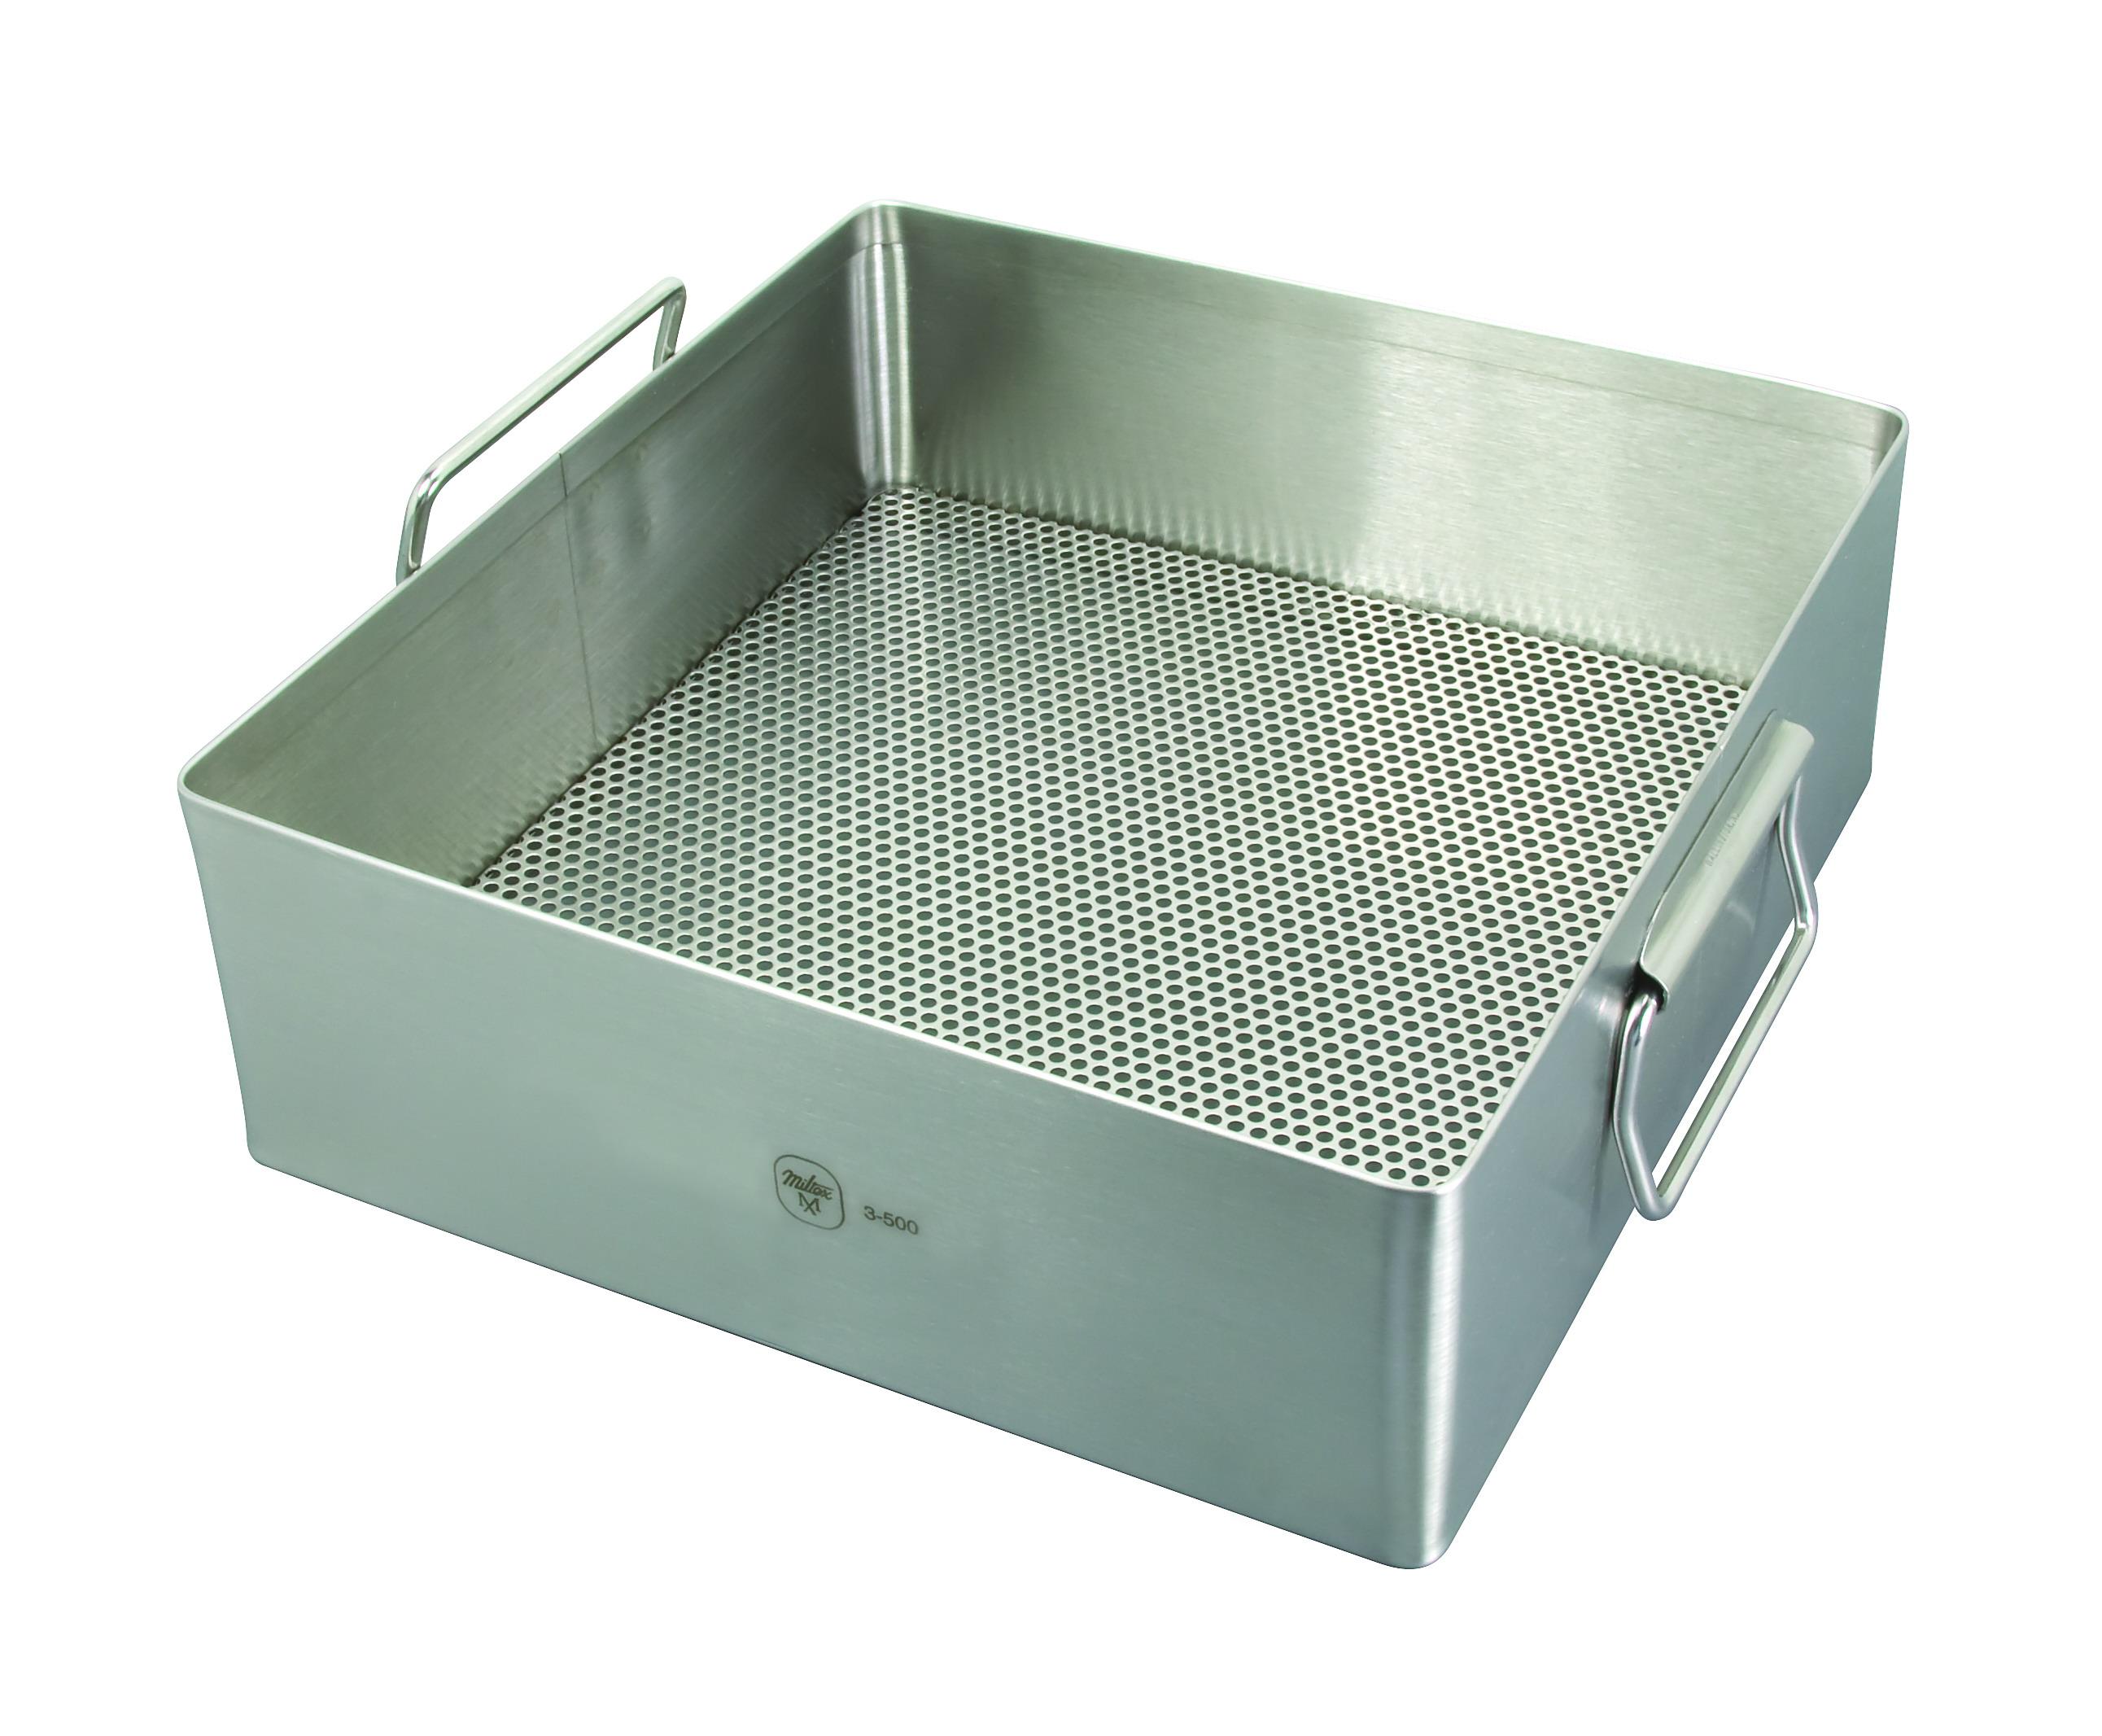 instrument-sterilizing-tray-10-x-10-1-2-x-3-1-2-254-x-26-x-89-cm-3-500-miltex.jpg